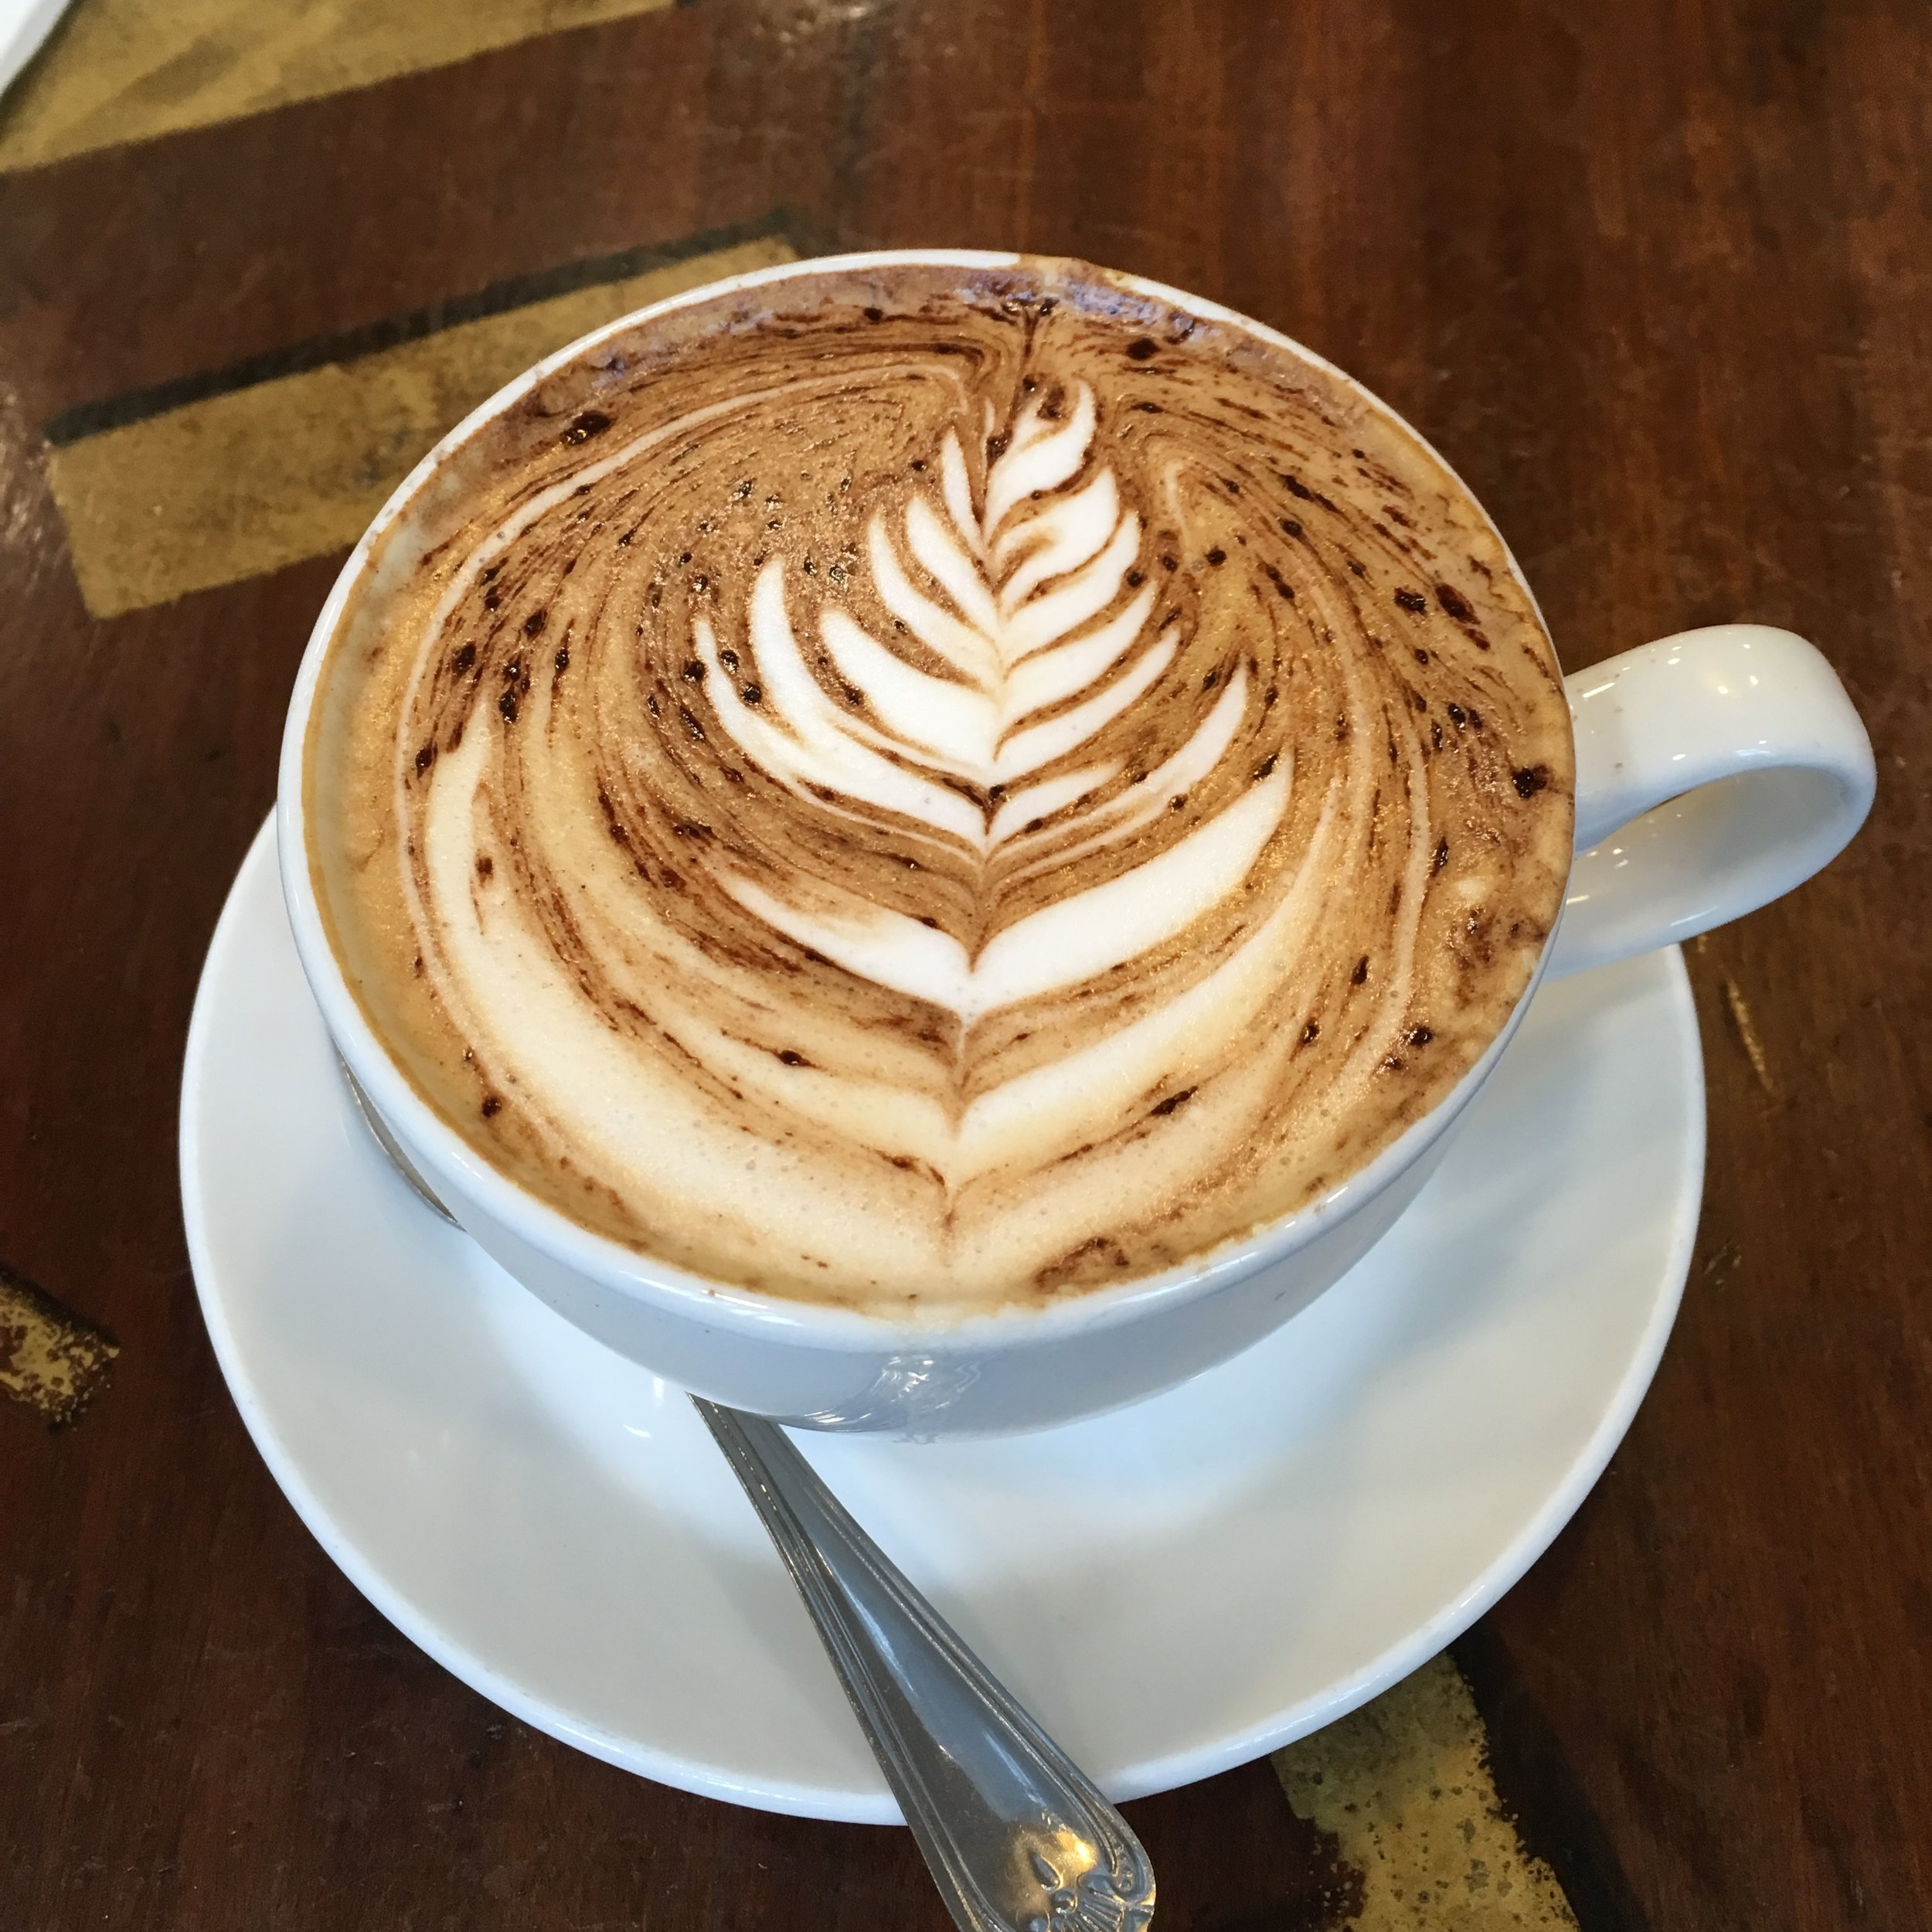 Dave's delicious cappuccino